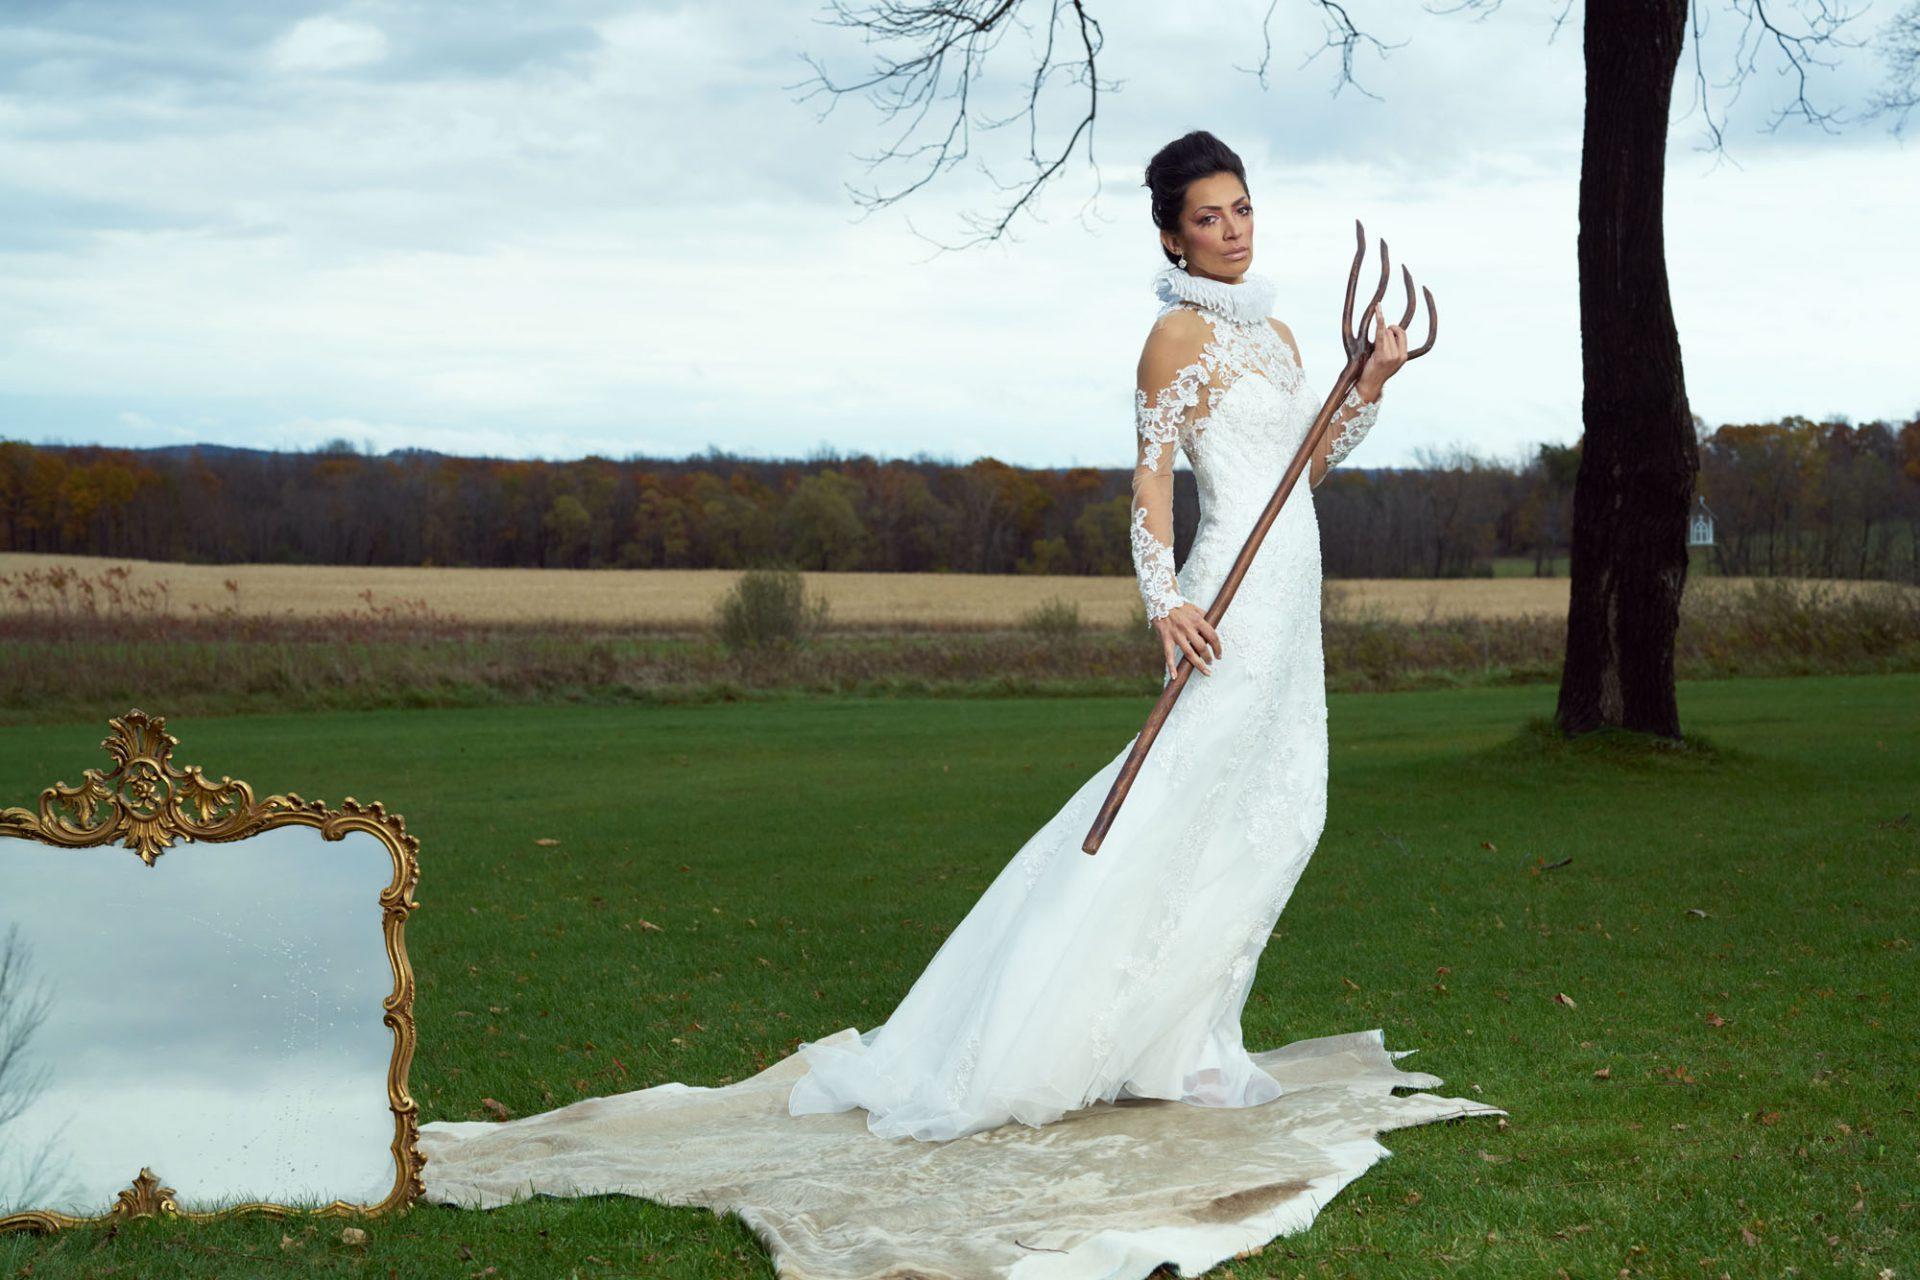 Stella's Bridal Boutique